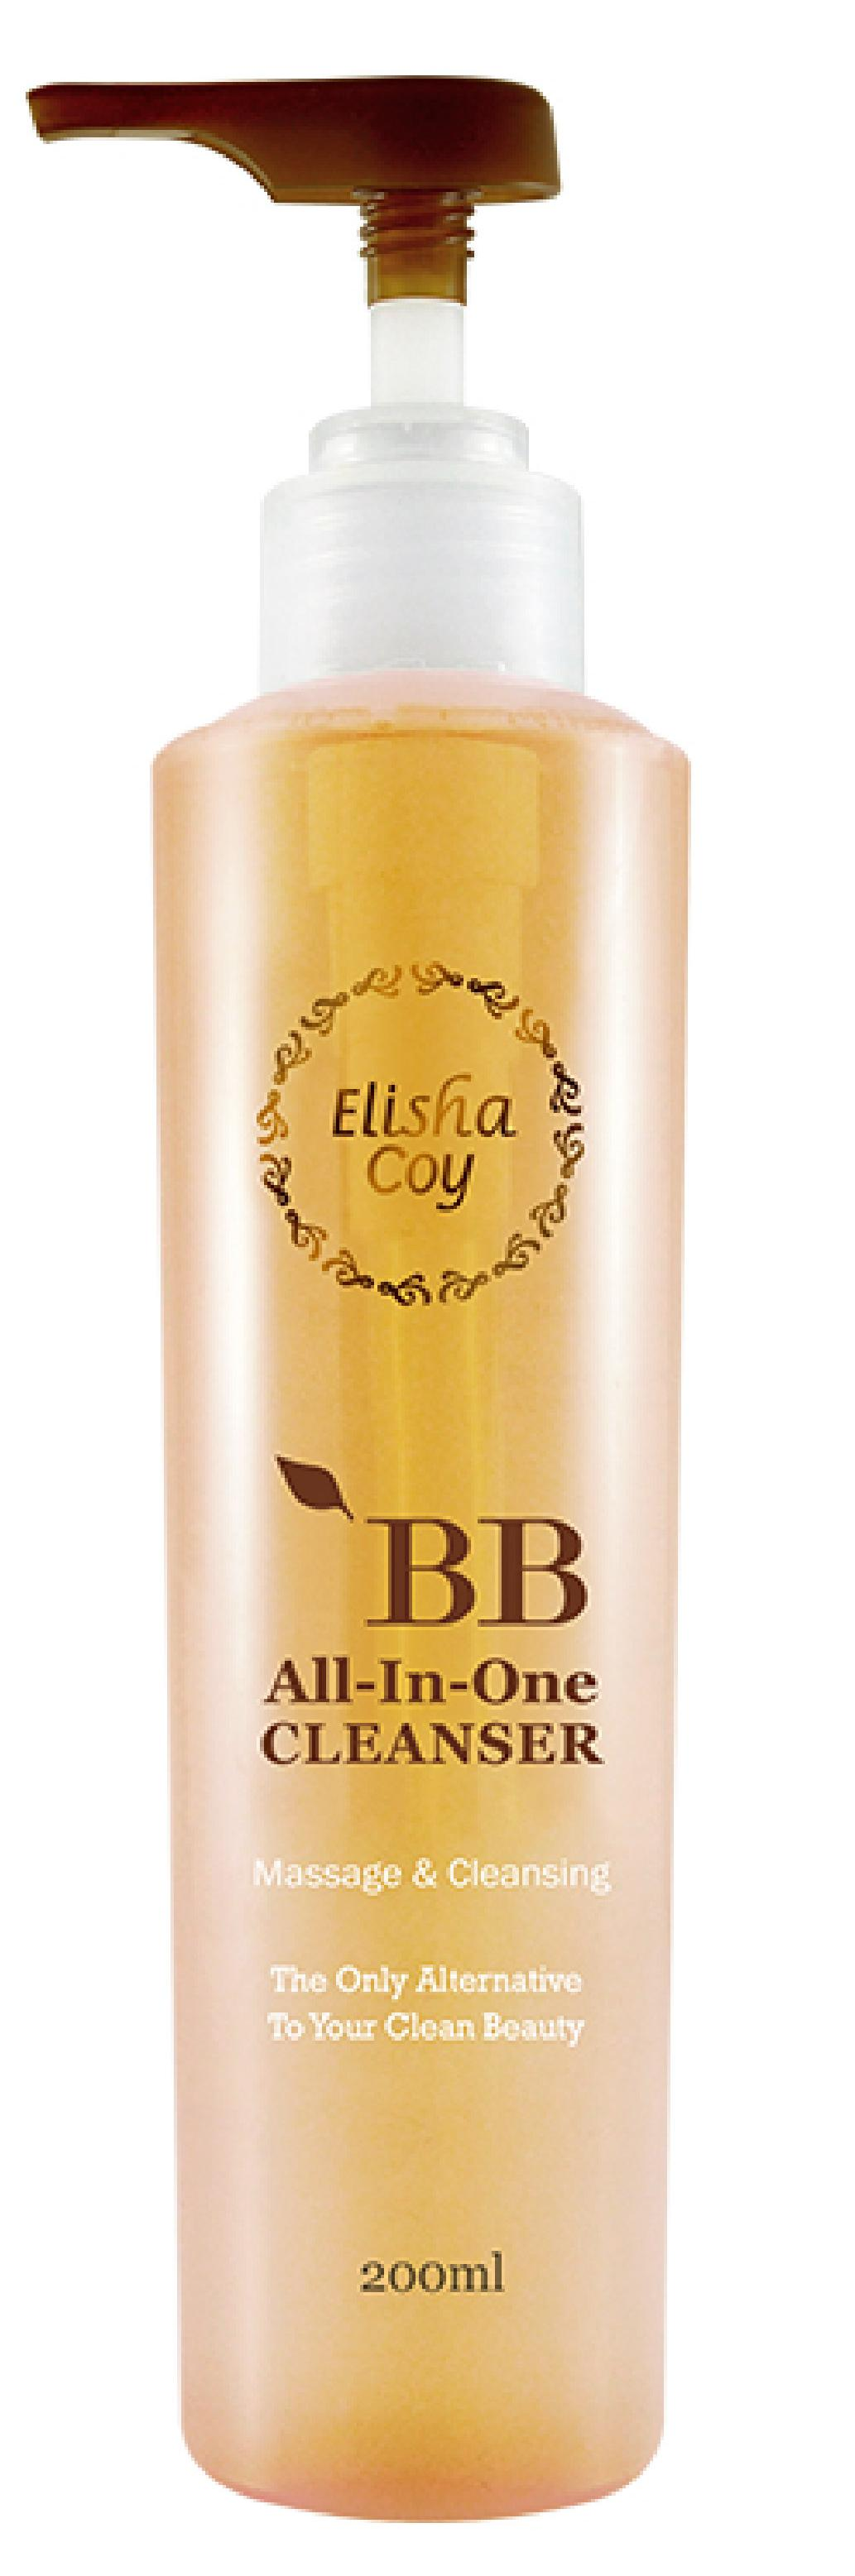 Elisha Coy BB Allin One Cleanser